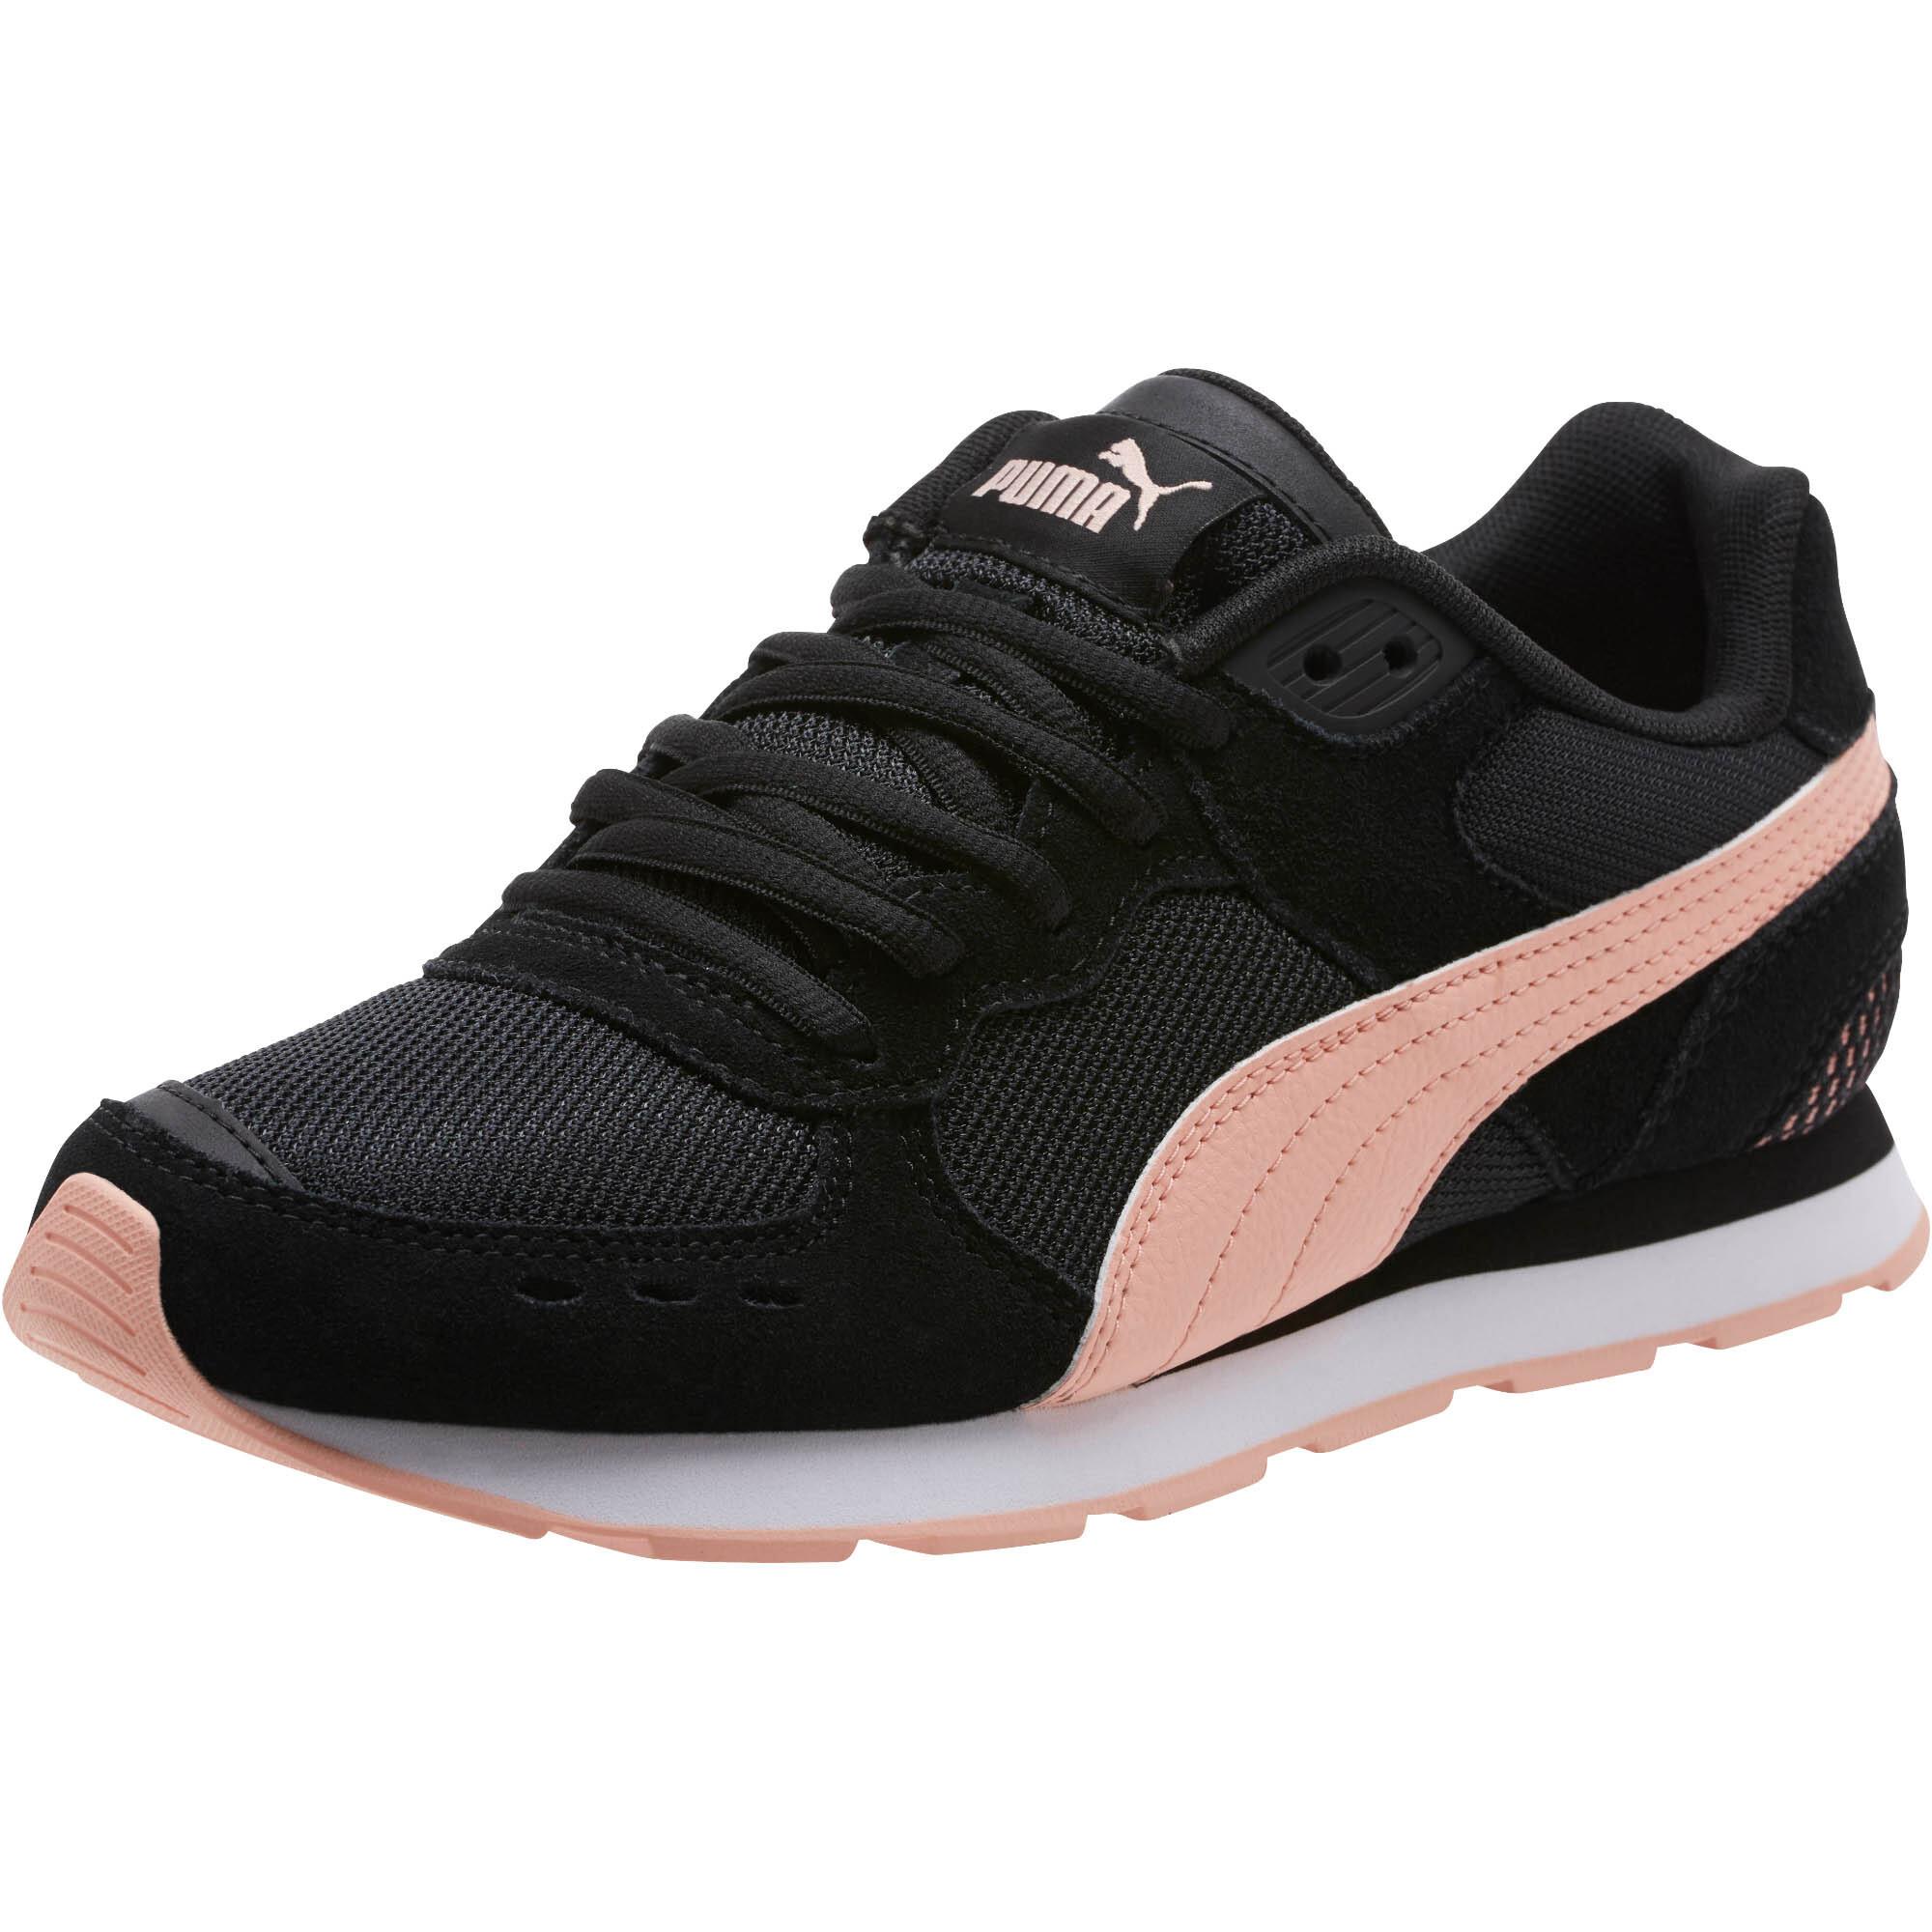 PUMA-Vista-Women-s-Sneakers-Women-Shoe-Basics thumbnail 9